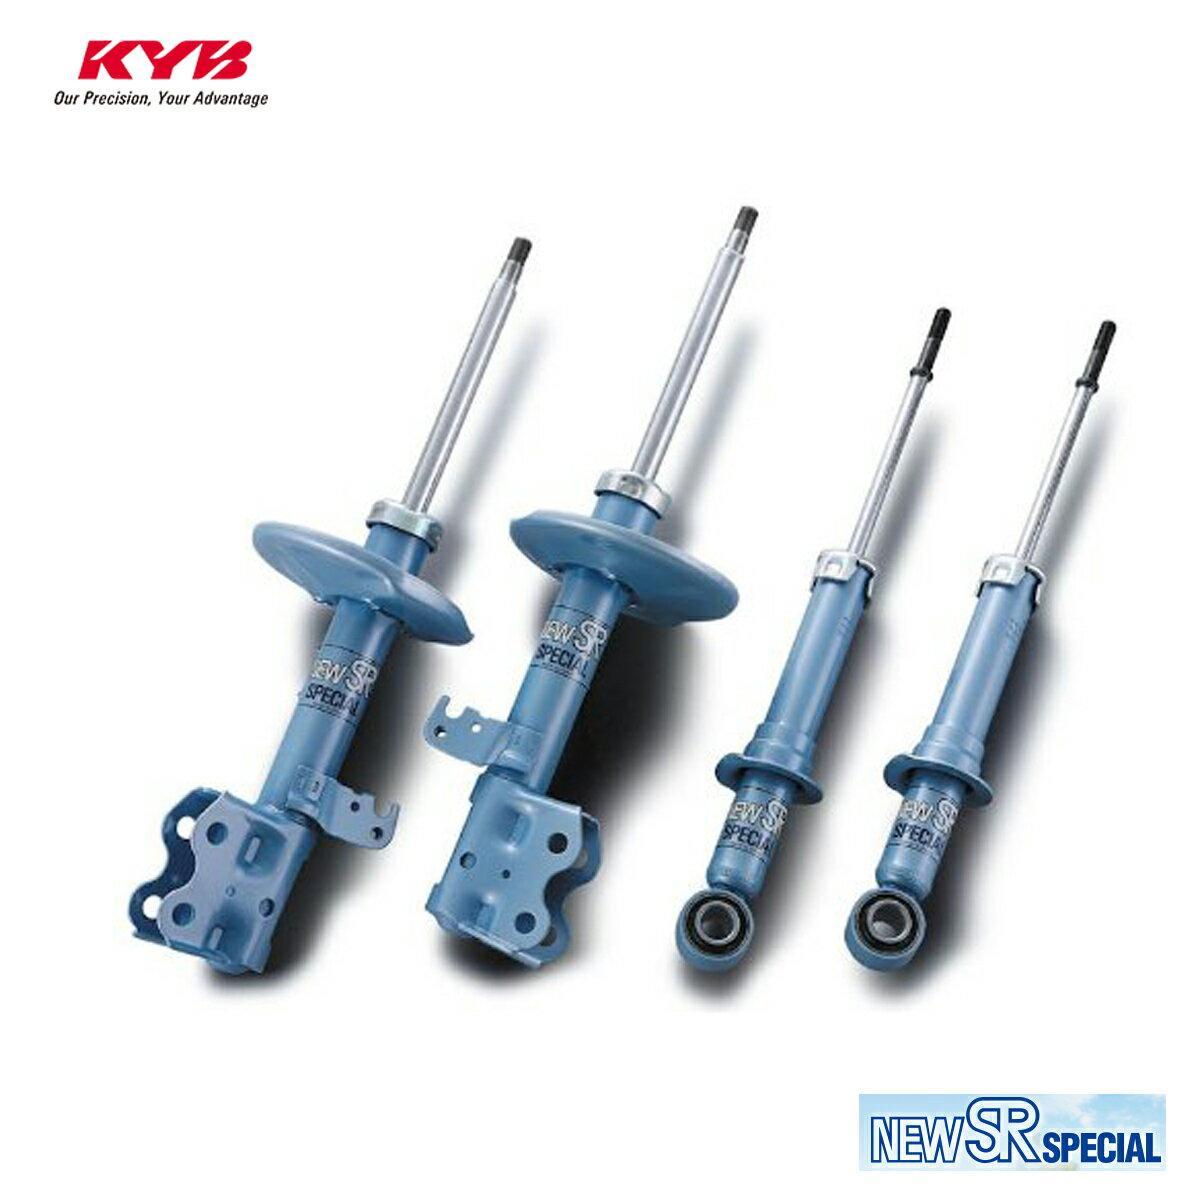 KYB カヤバ Kei HN11S ショックアブソーバー 1台分 NEW SR SPECIAL NS-52681052 配送先条件有り